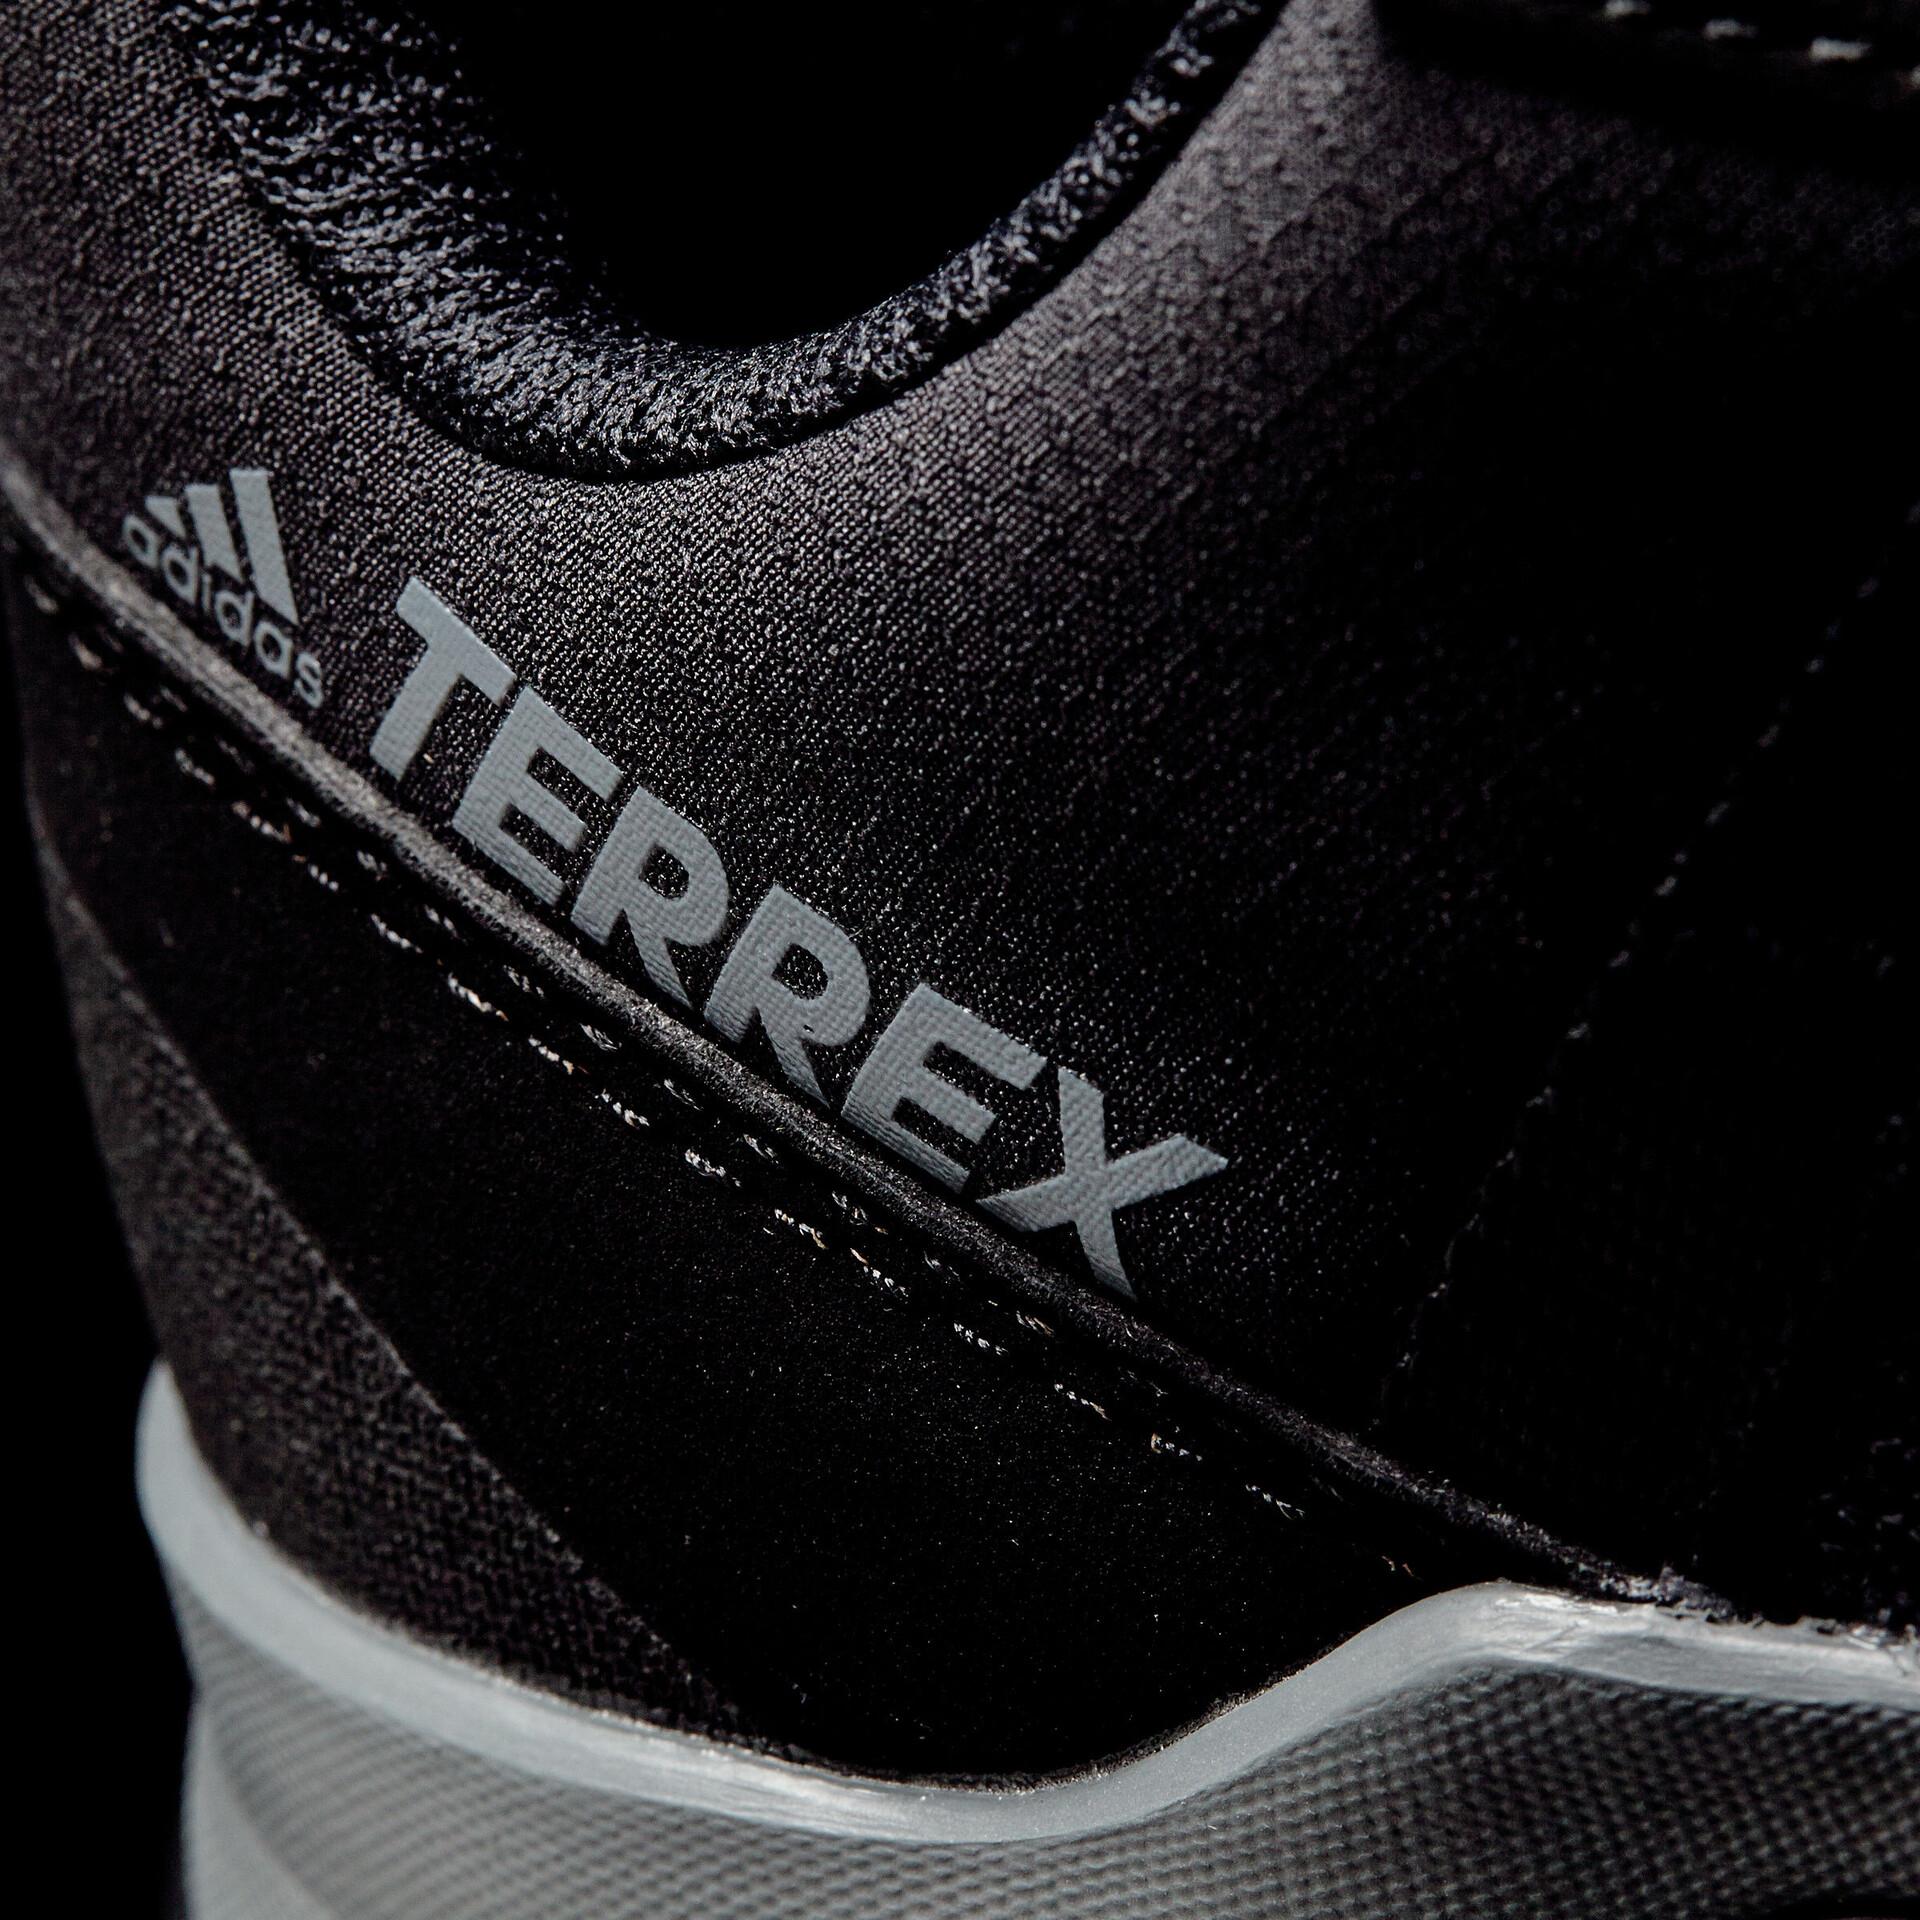 P Sko Terrex SortFind Udstyr Outdoort jamp; B rn Adidas Ax2r cu3l1JFTK